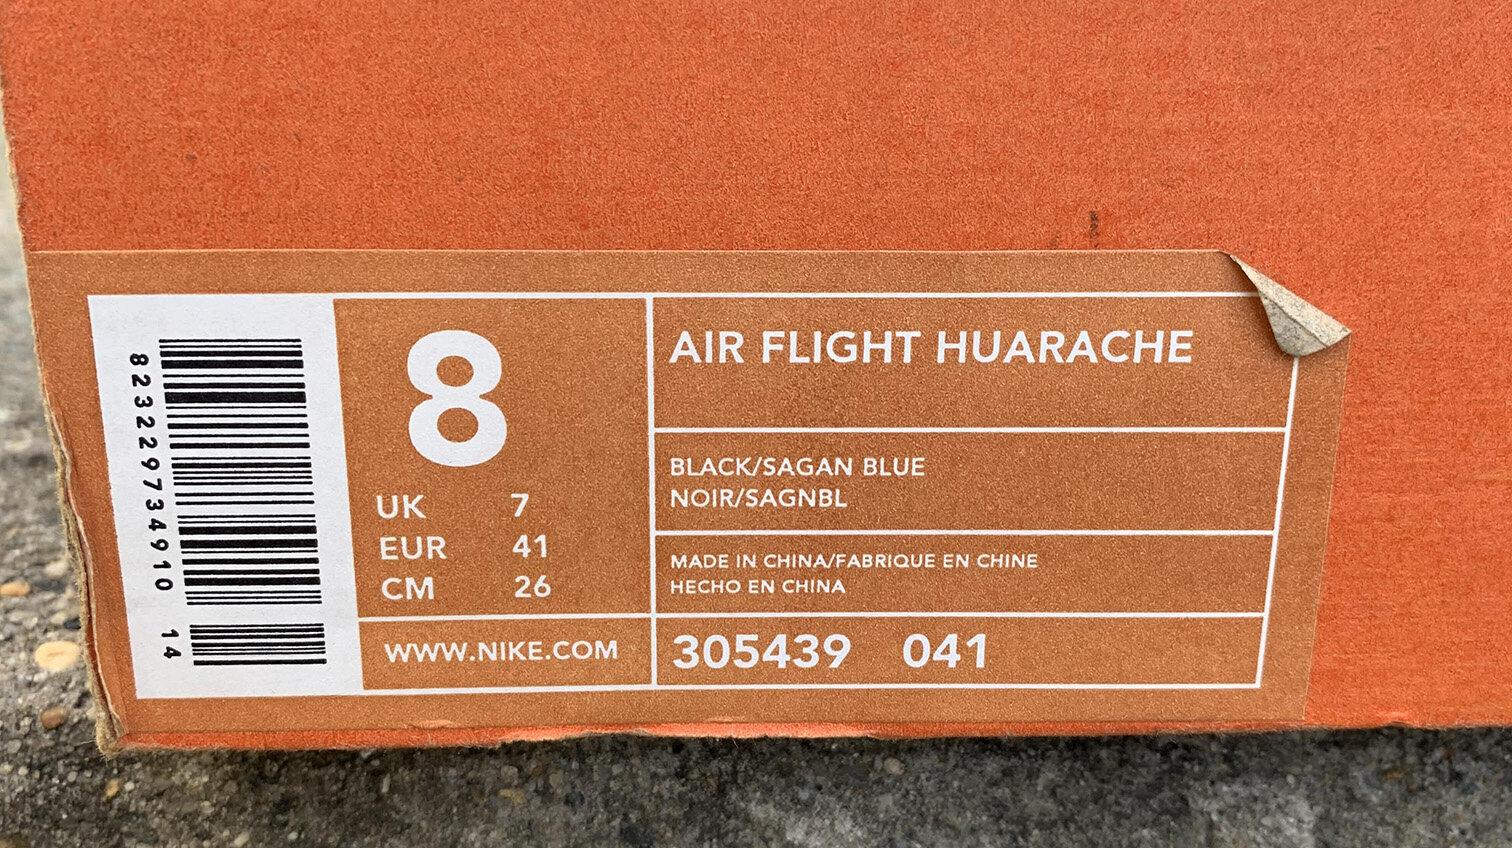 Ladrillo Más temprano Sada  Nike Air Flight Huarache Sagan Blue (Size 8) DS — Roots